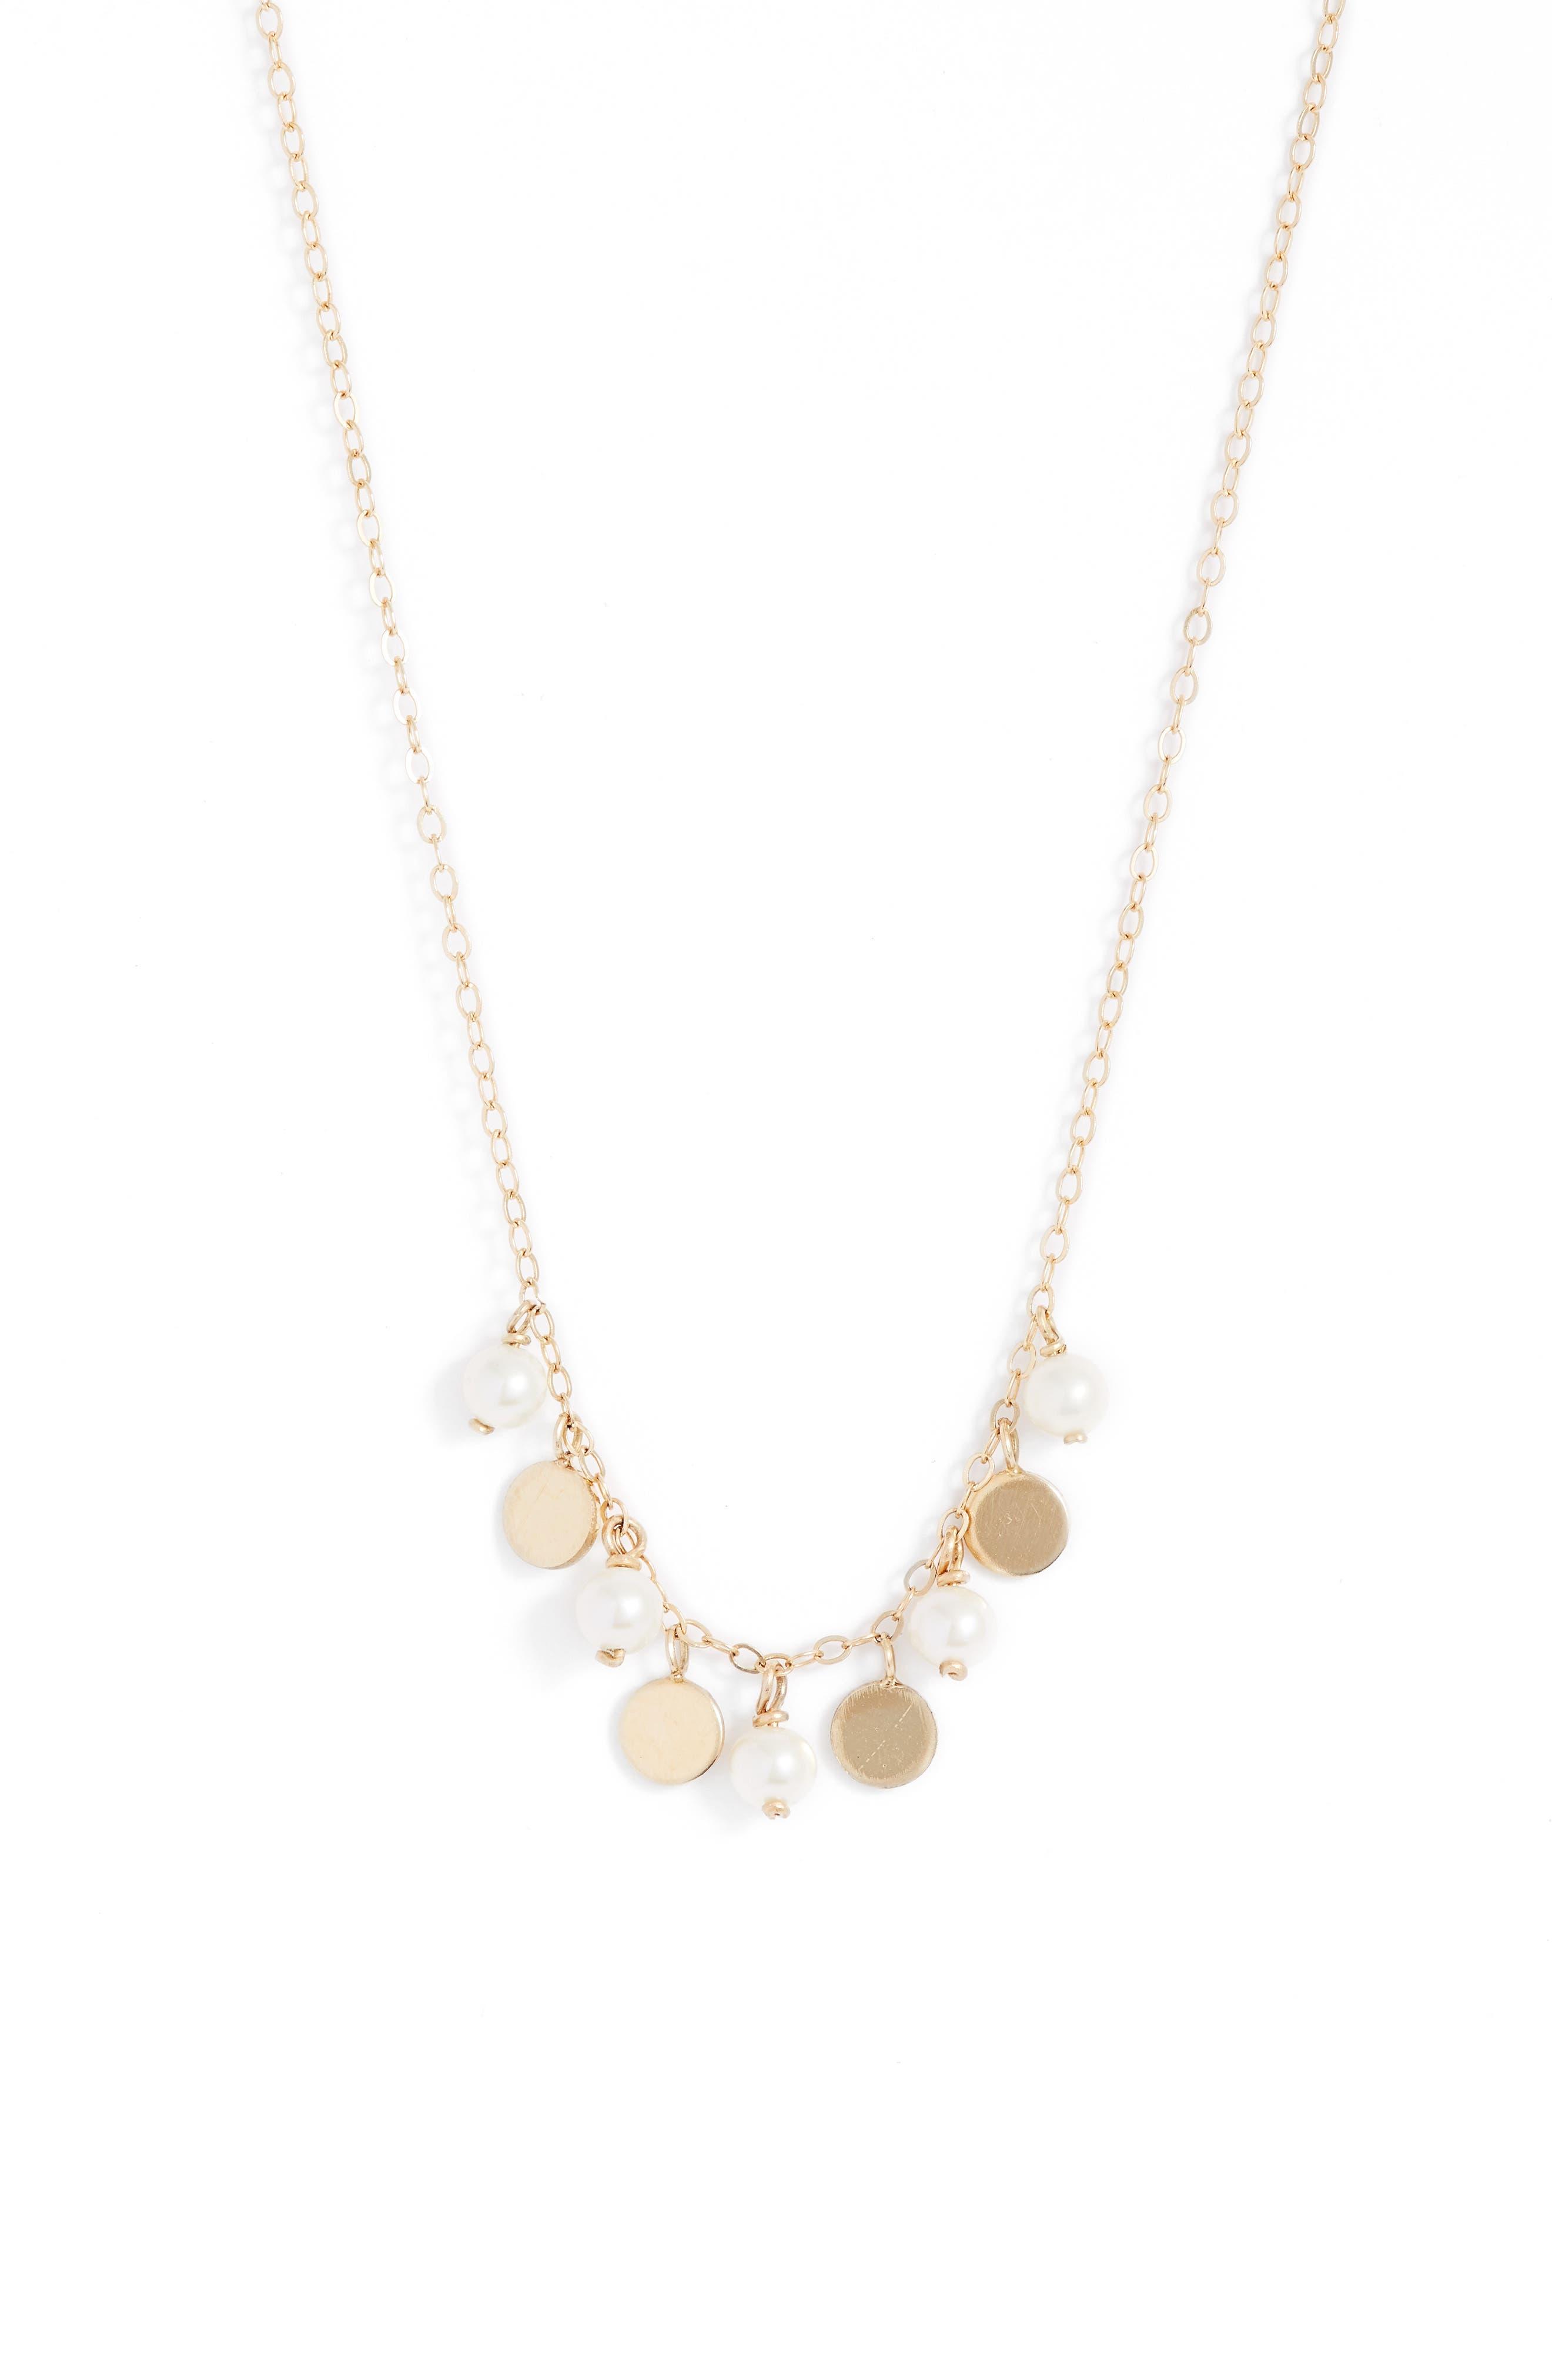 Confetti Pearl Gold Necklace,                         Main,                         color, YELLOW GOLD/ WHITE PEARL